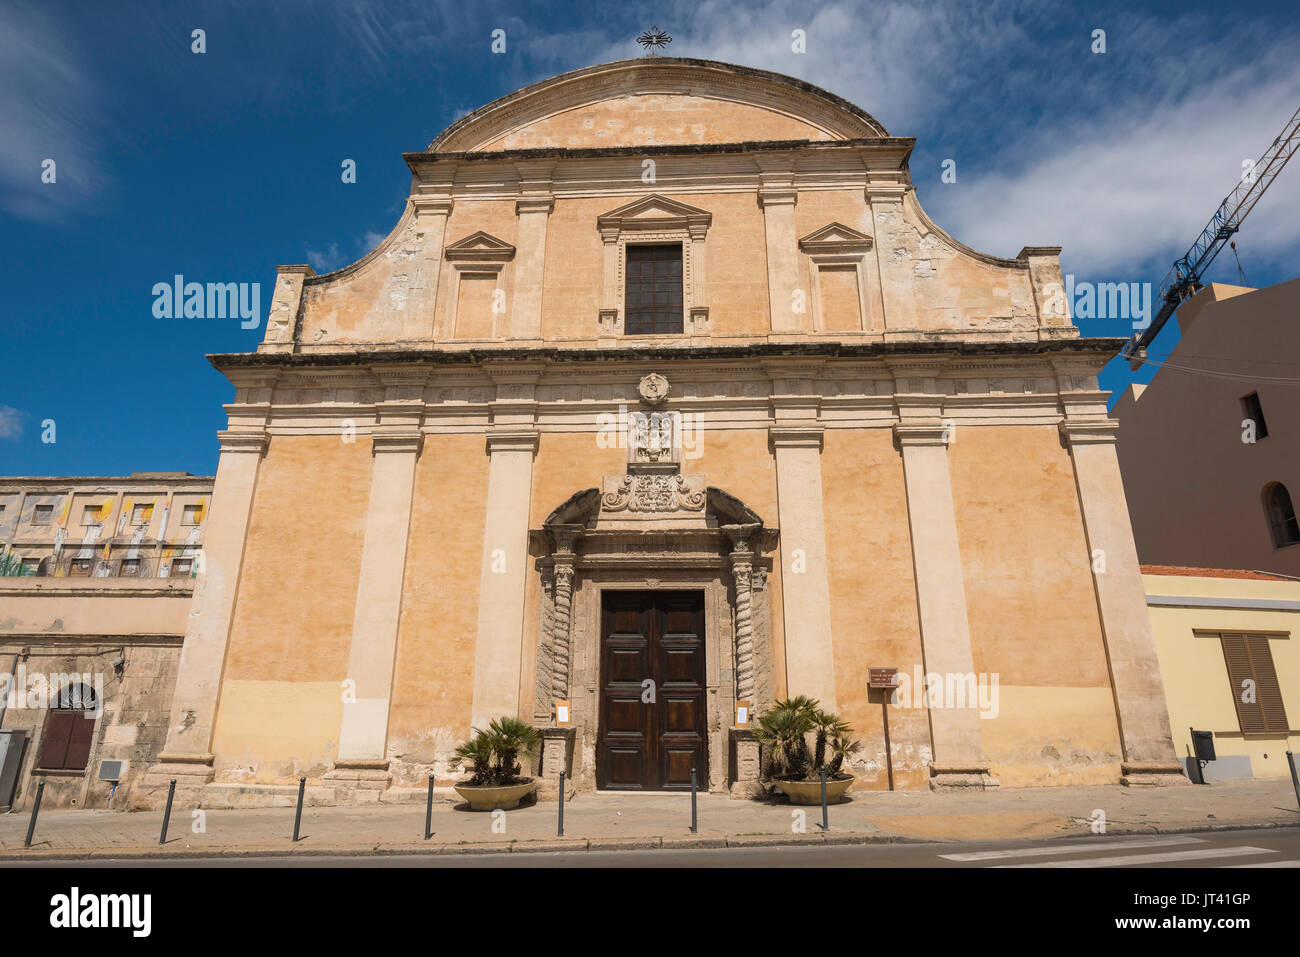 Sassari Sardinien, die barocke Fassade der Kirche Sant'Antonio Abate in Sassari, Sardinien. Stockbild